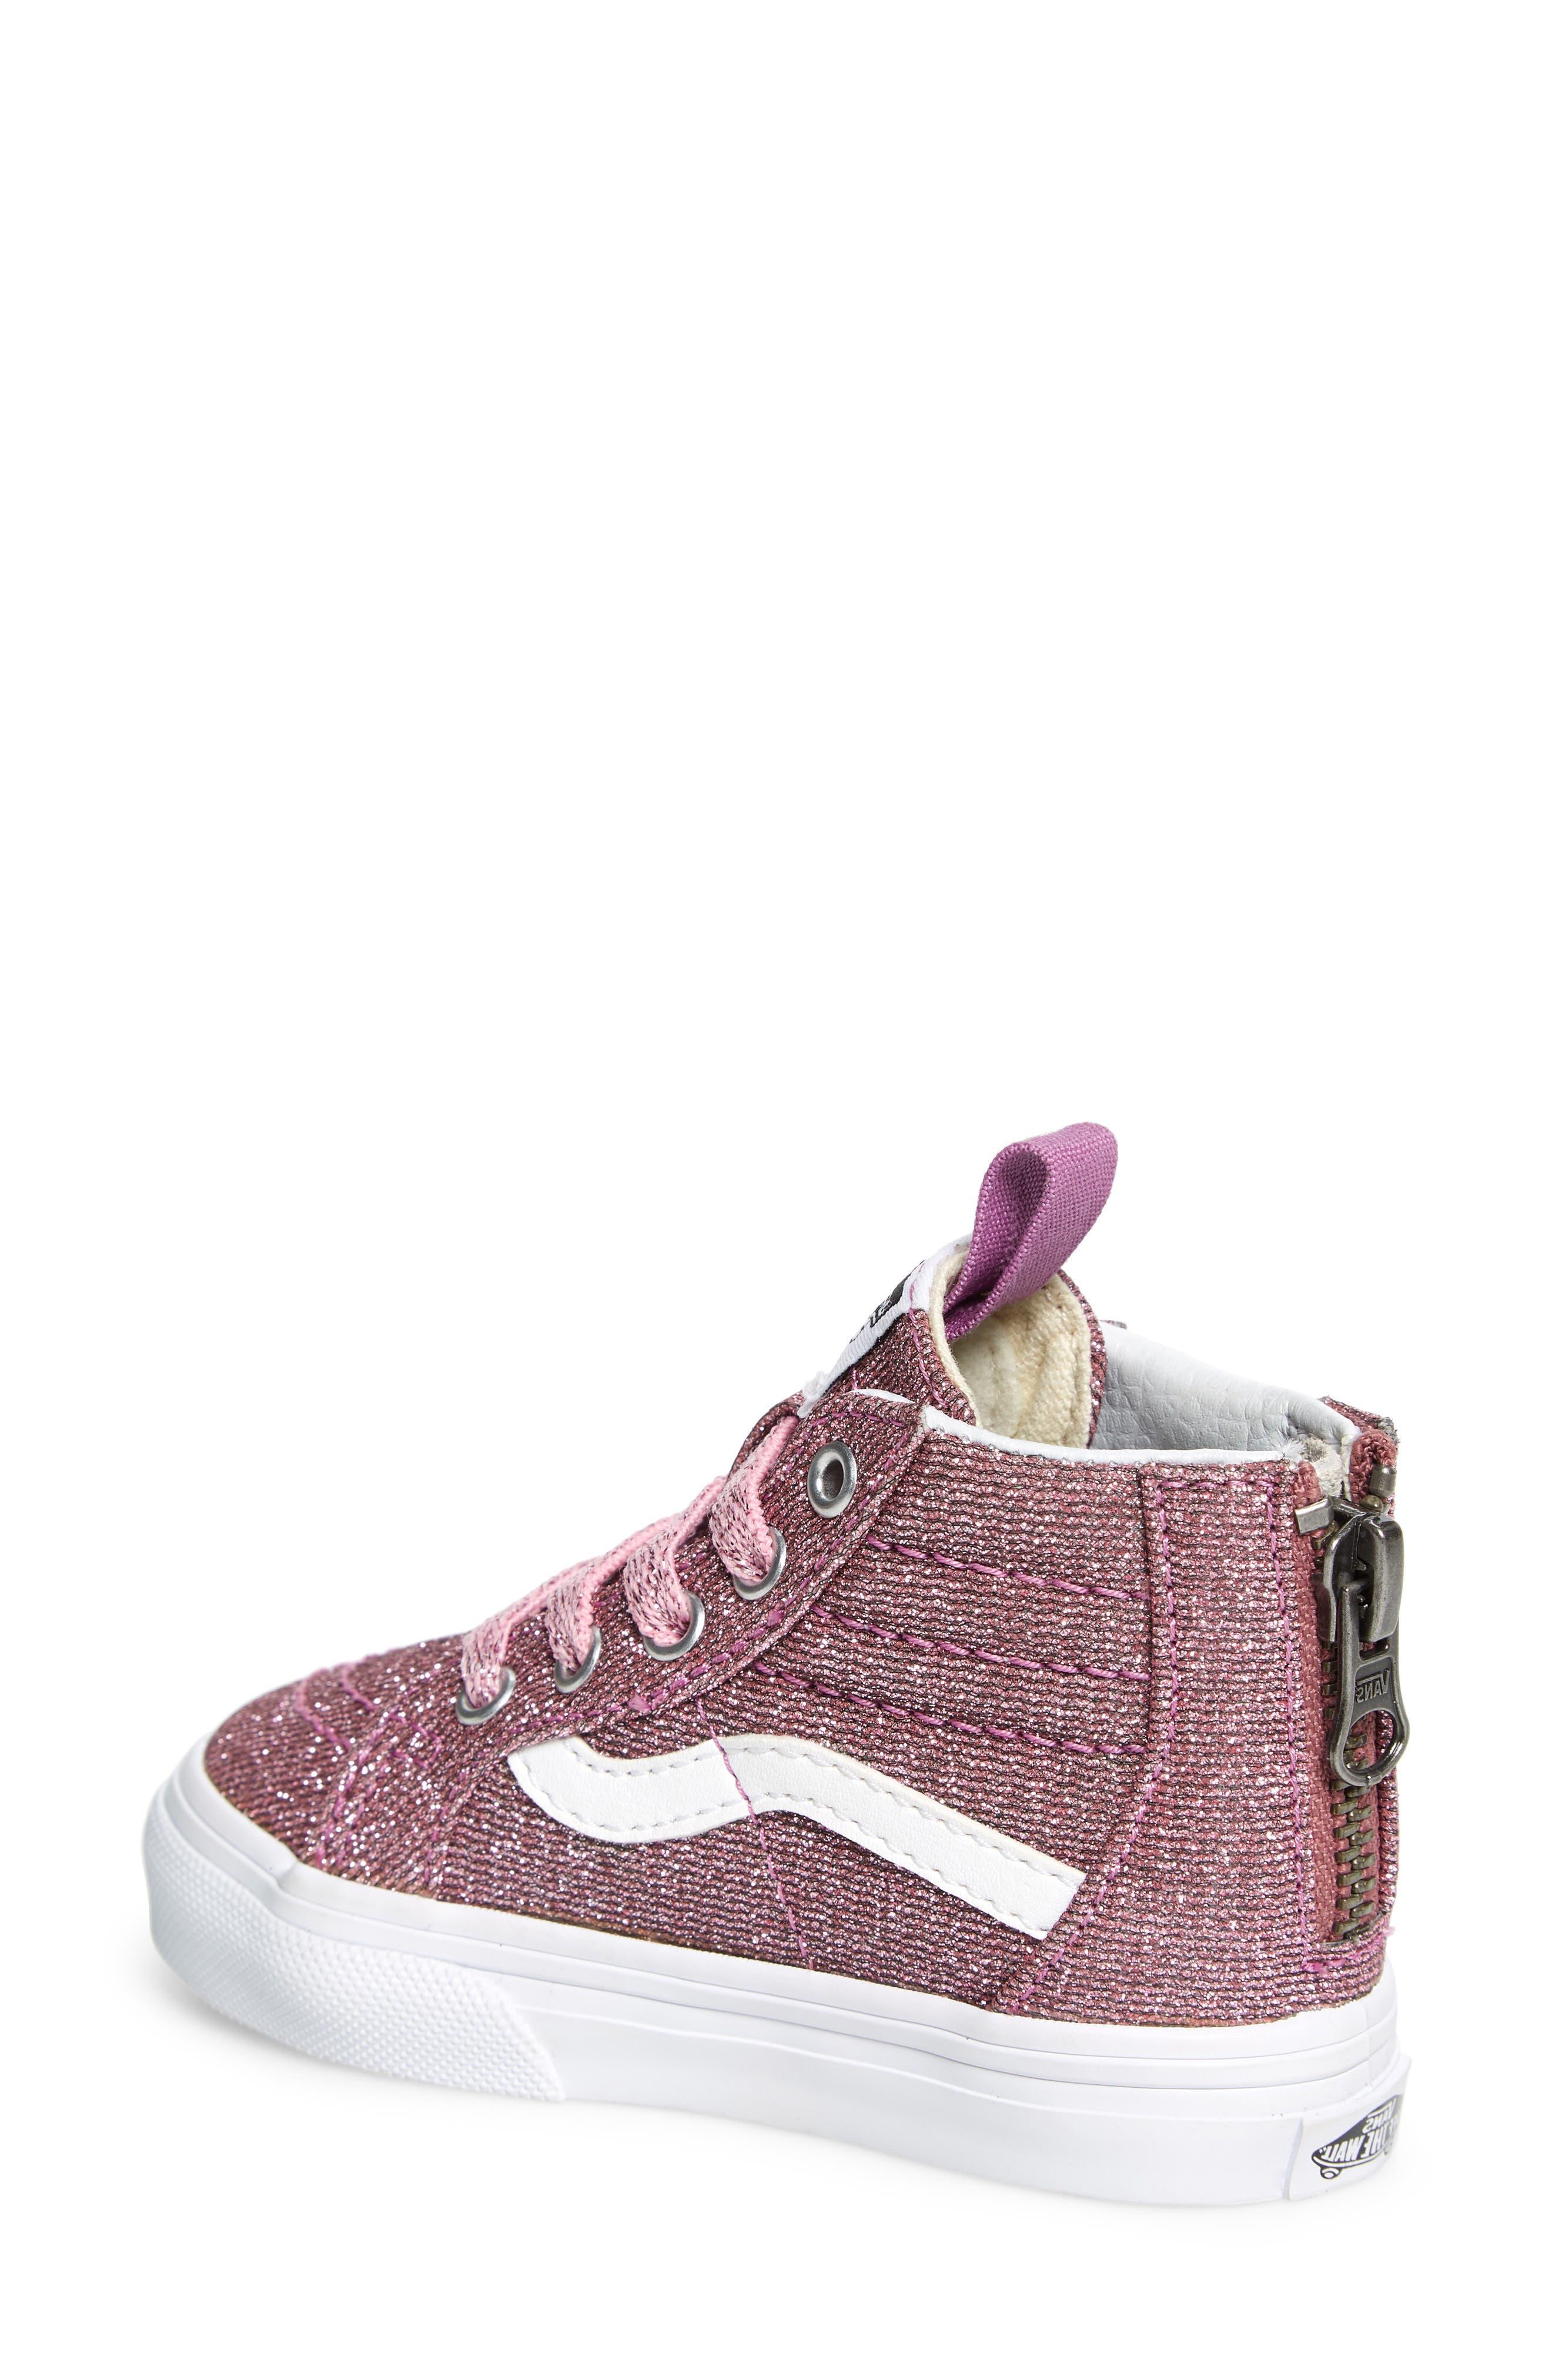 Sk8-Hi Zip Sneaker,                             Alternate thumbnail 2, color,                             Lurex Glitter Pink/ True White